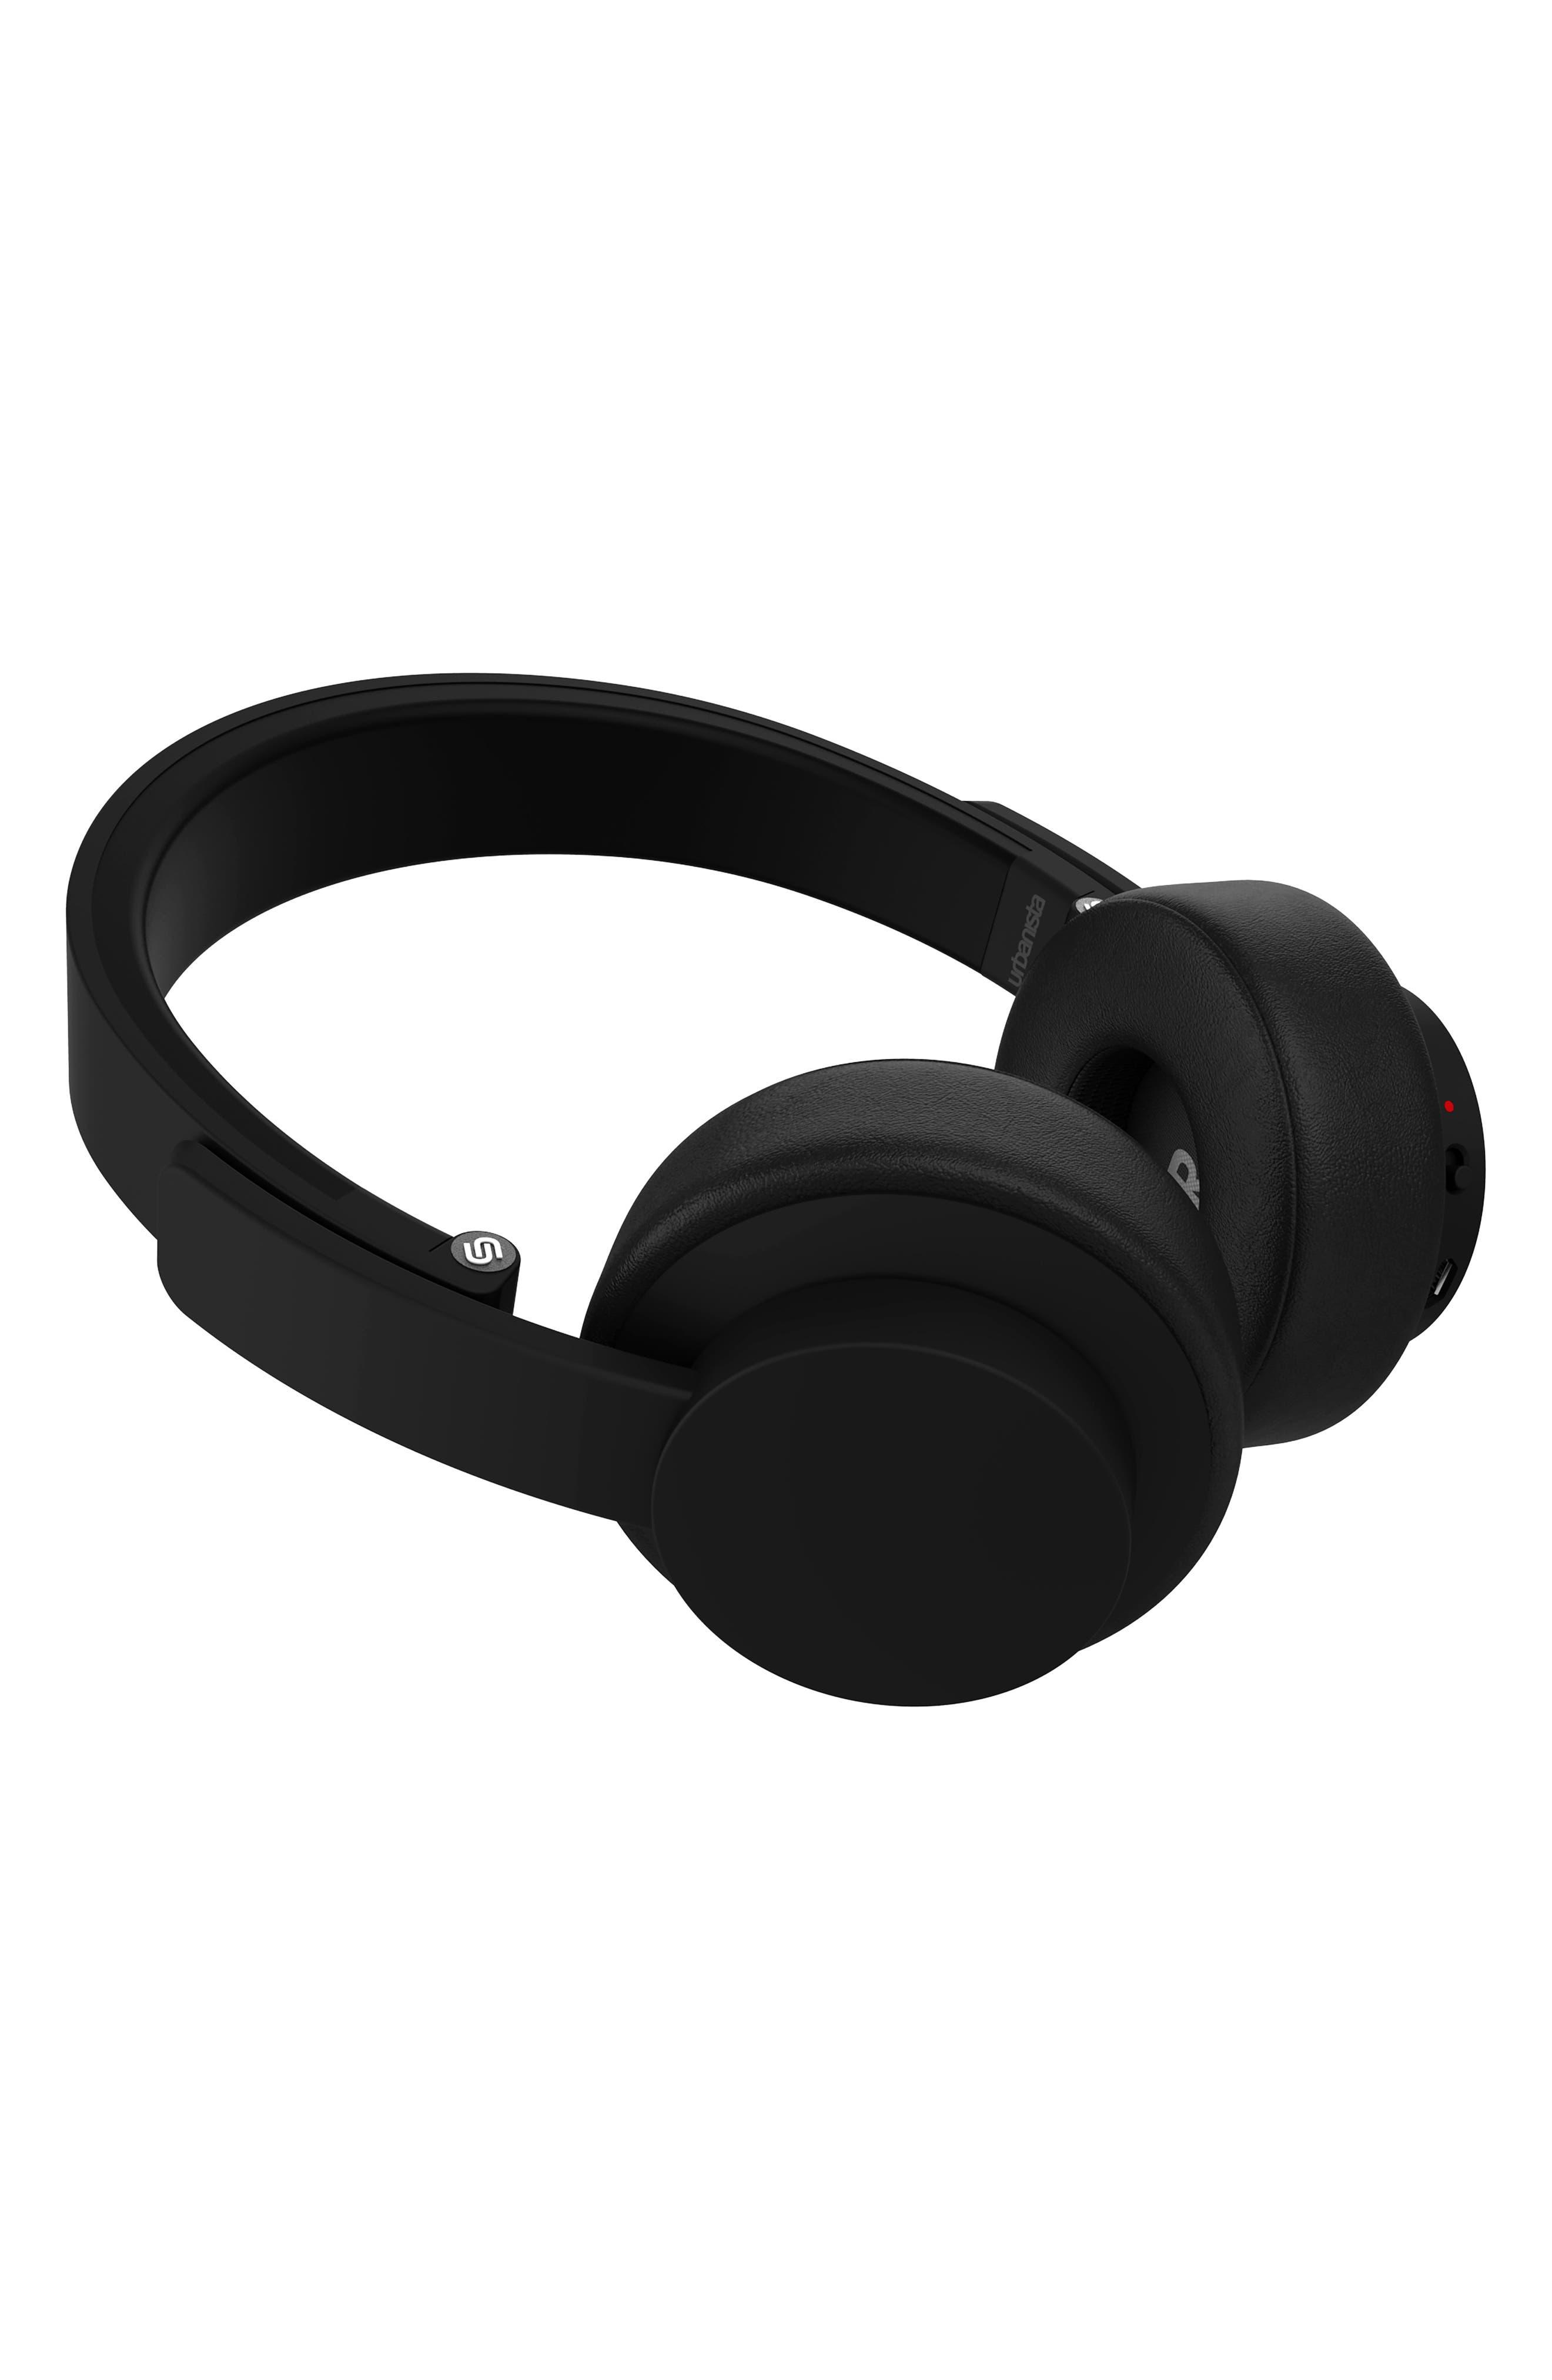 Seattle Wireless Headphones,                             Alternate thumbnail 2, color,                             001